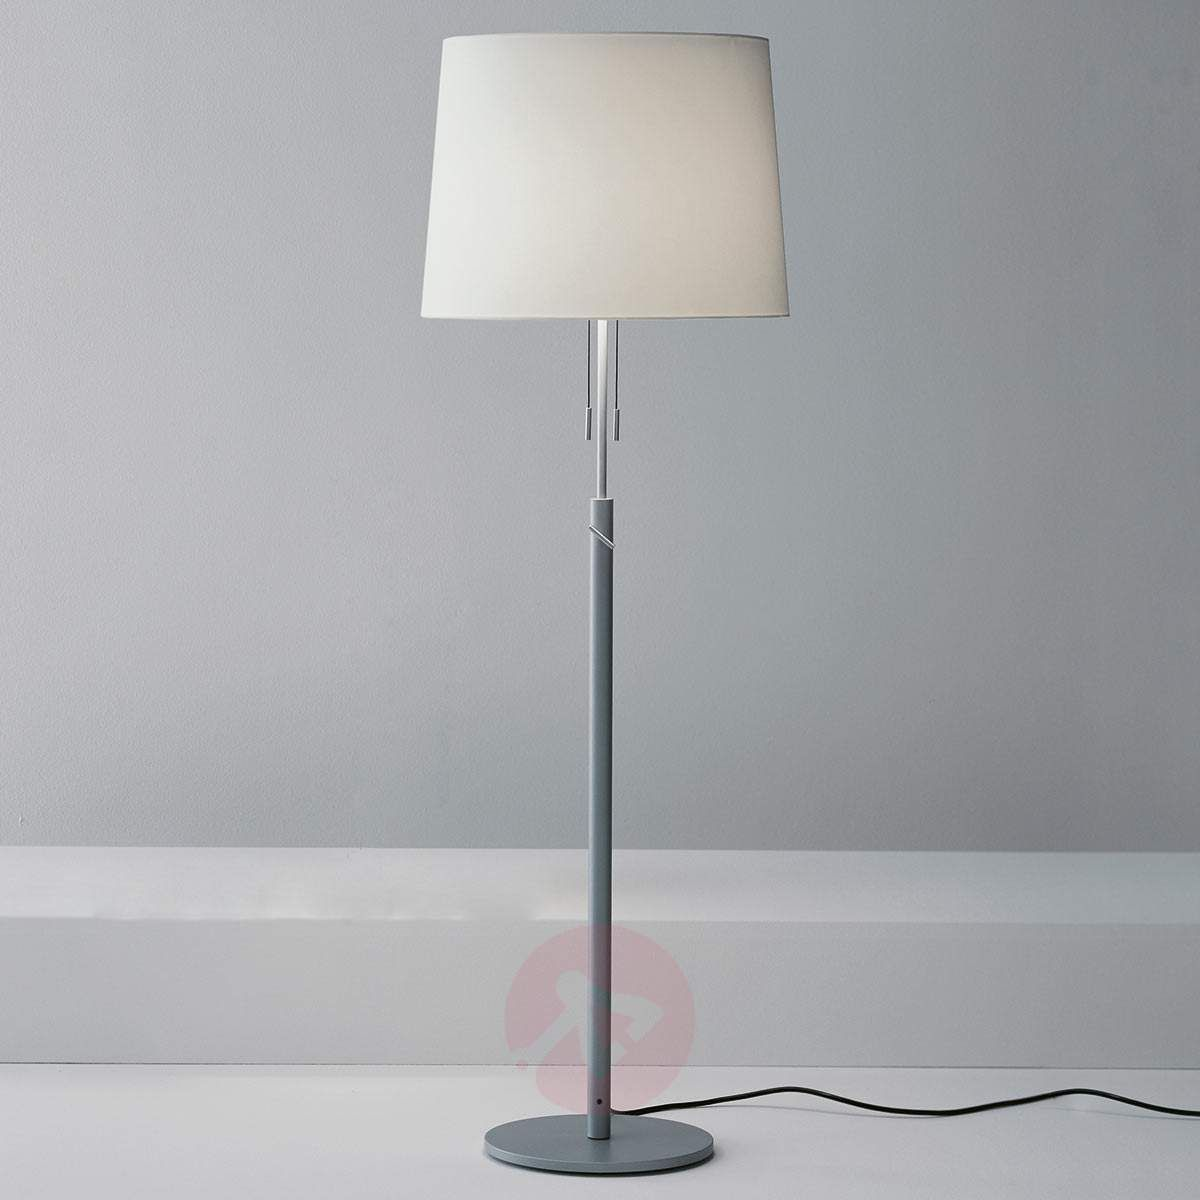 stare lampy stojace w kuchni